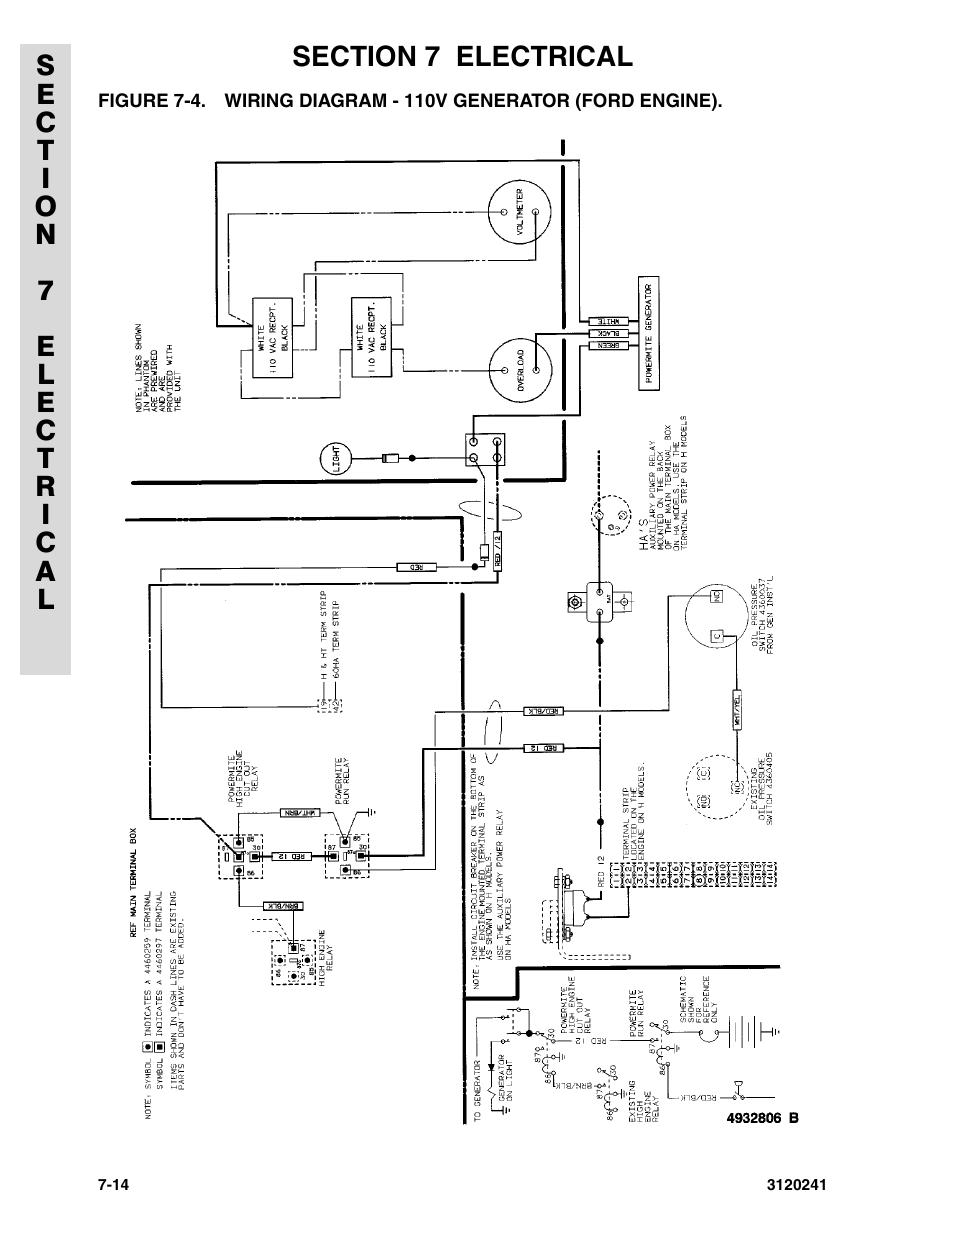 Wiring Diagram - 110v Generator  Ford Engine